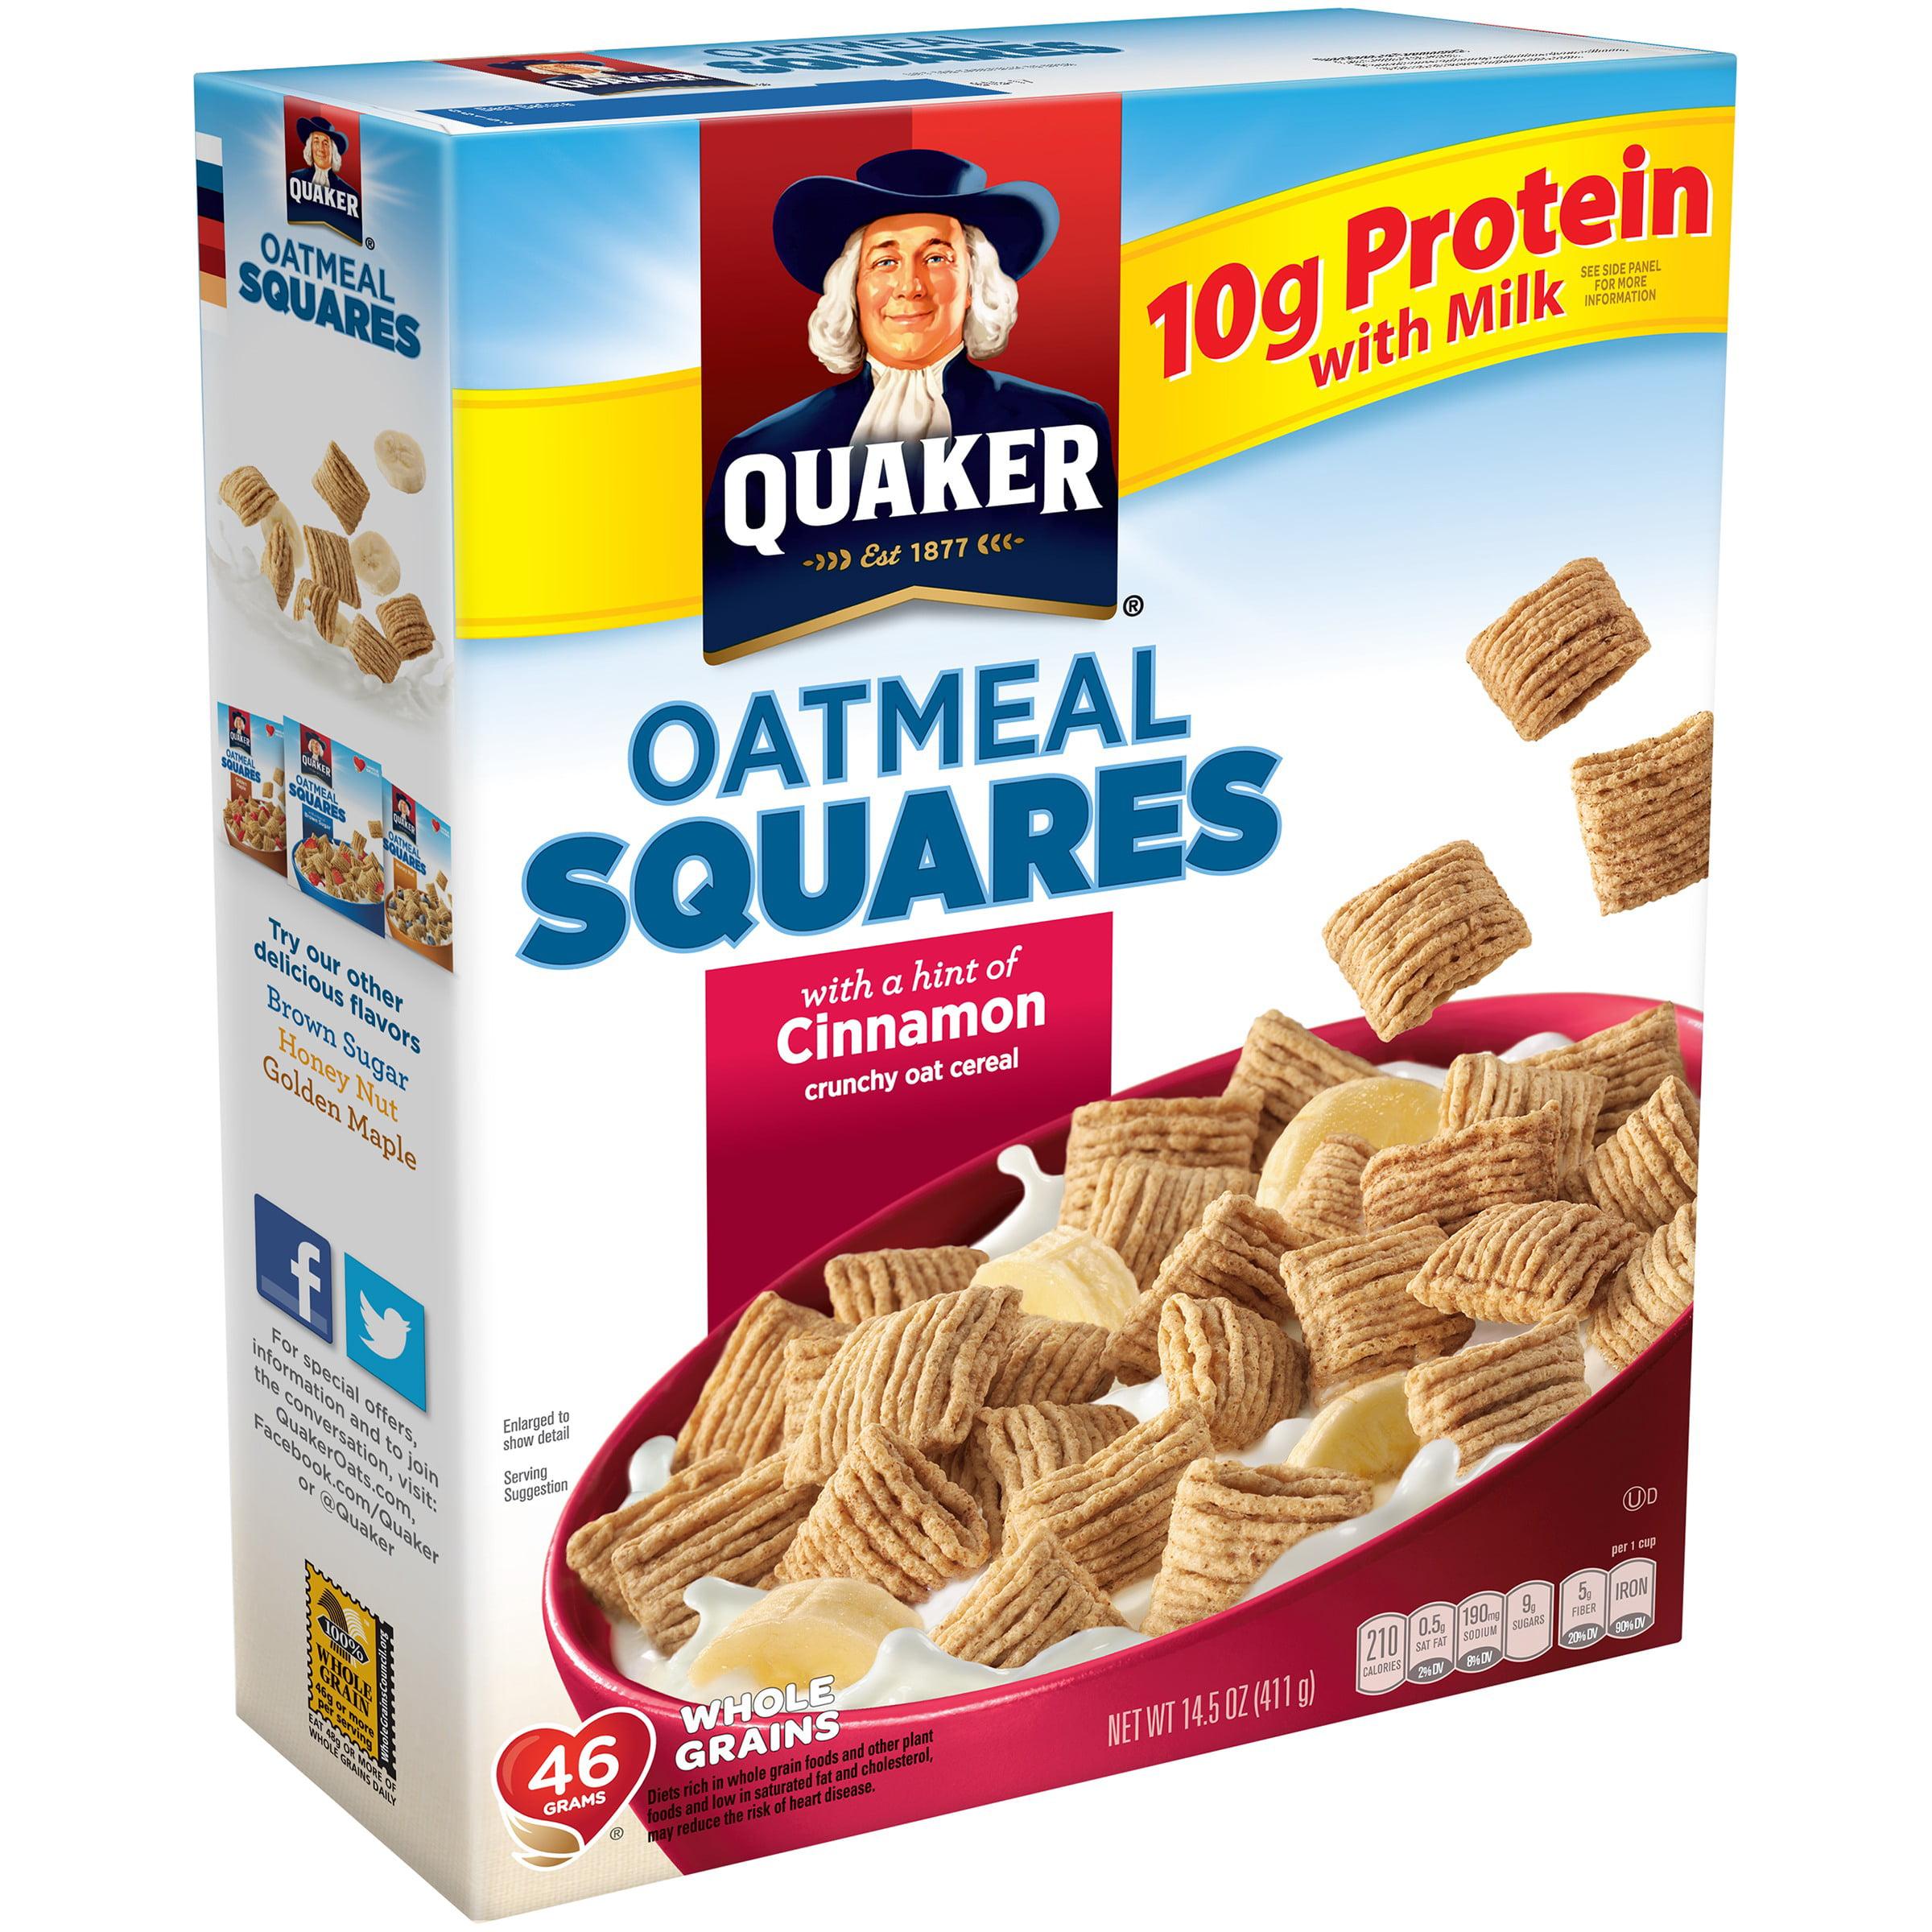 (2 Pack) Quaker Oatmeal Squares Breakfast Cereal, Cinnamon, 14.5 oz Box